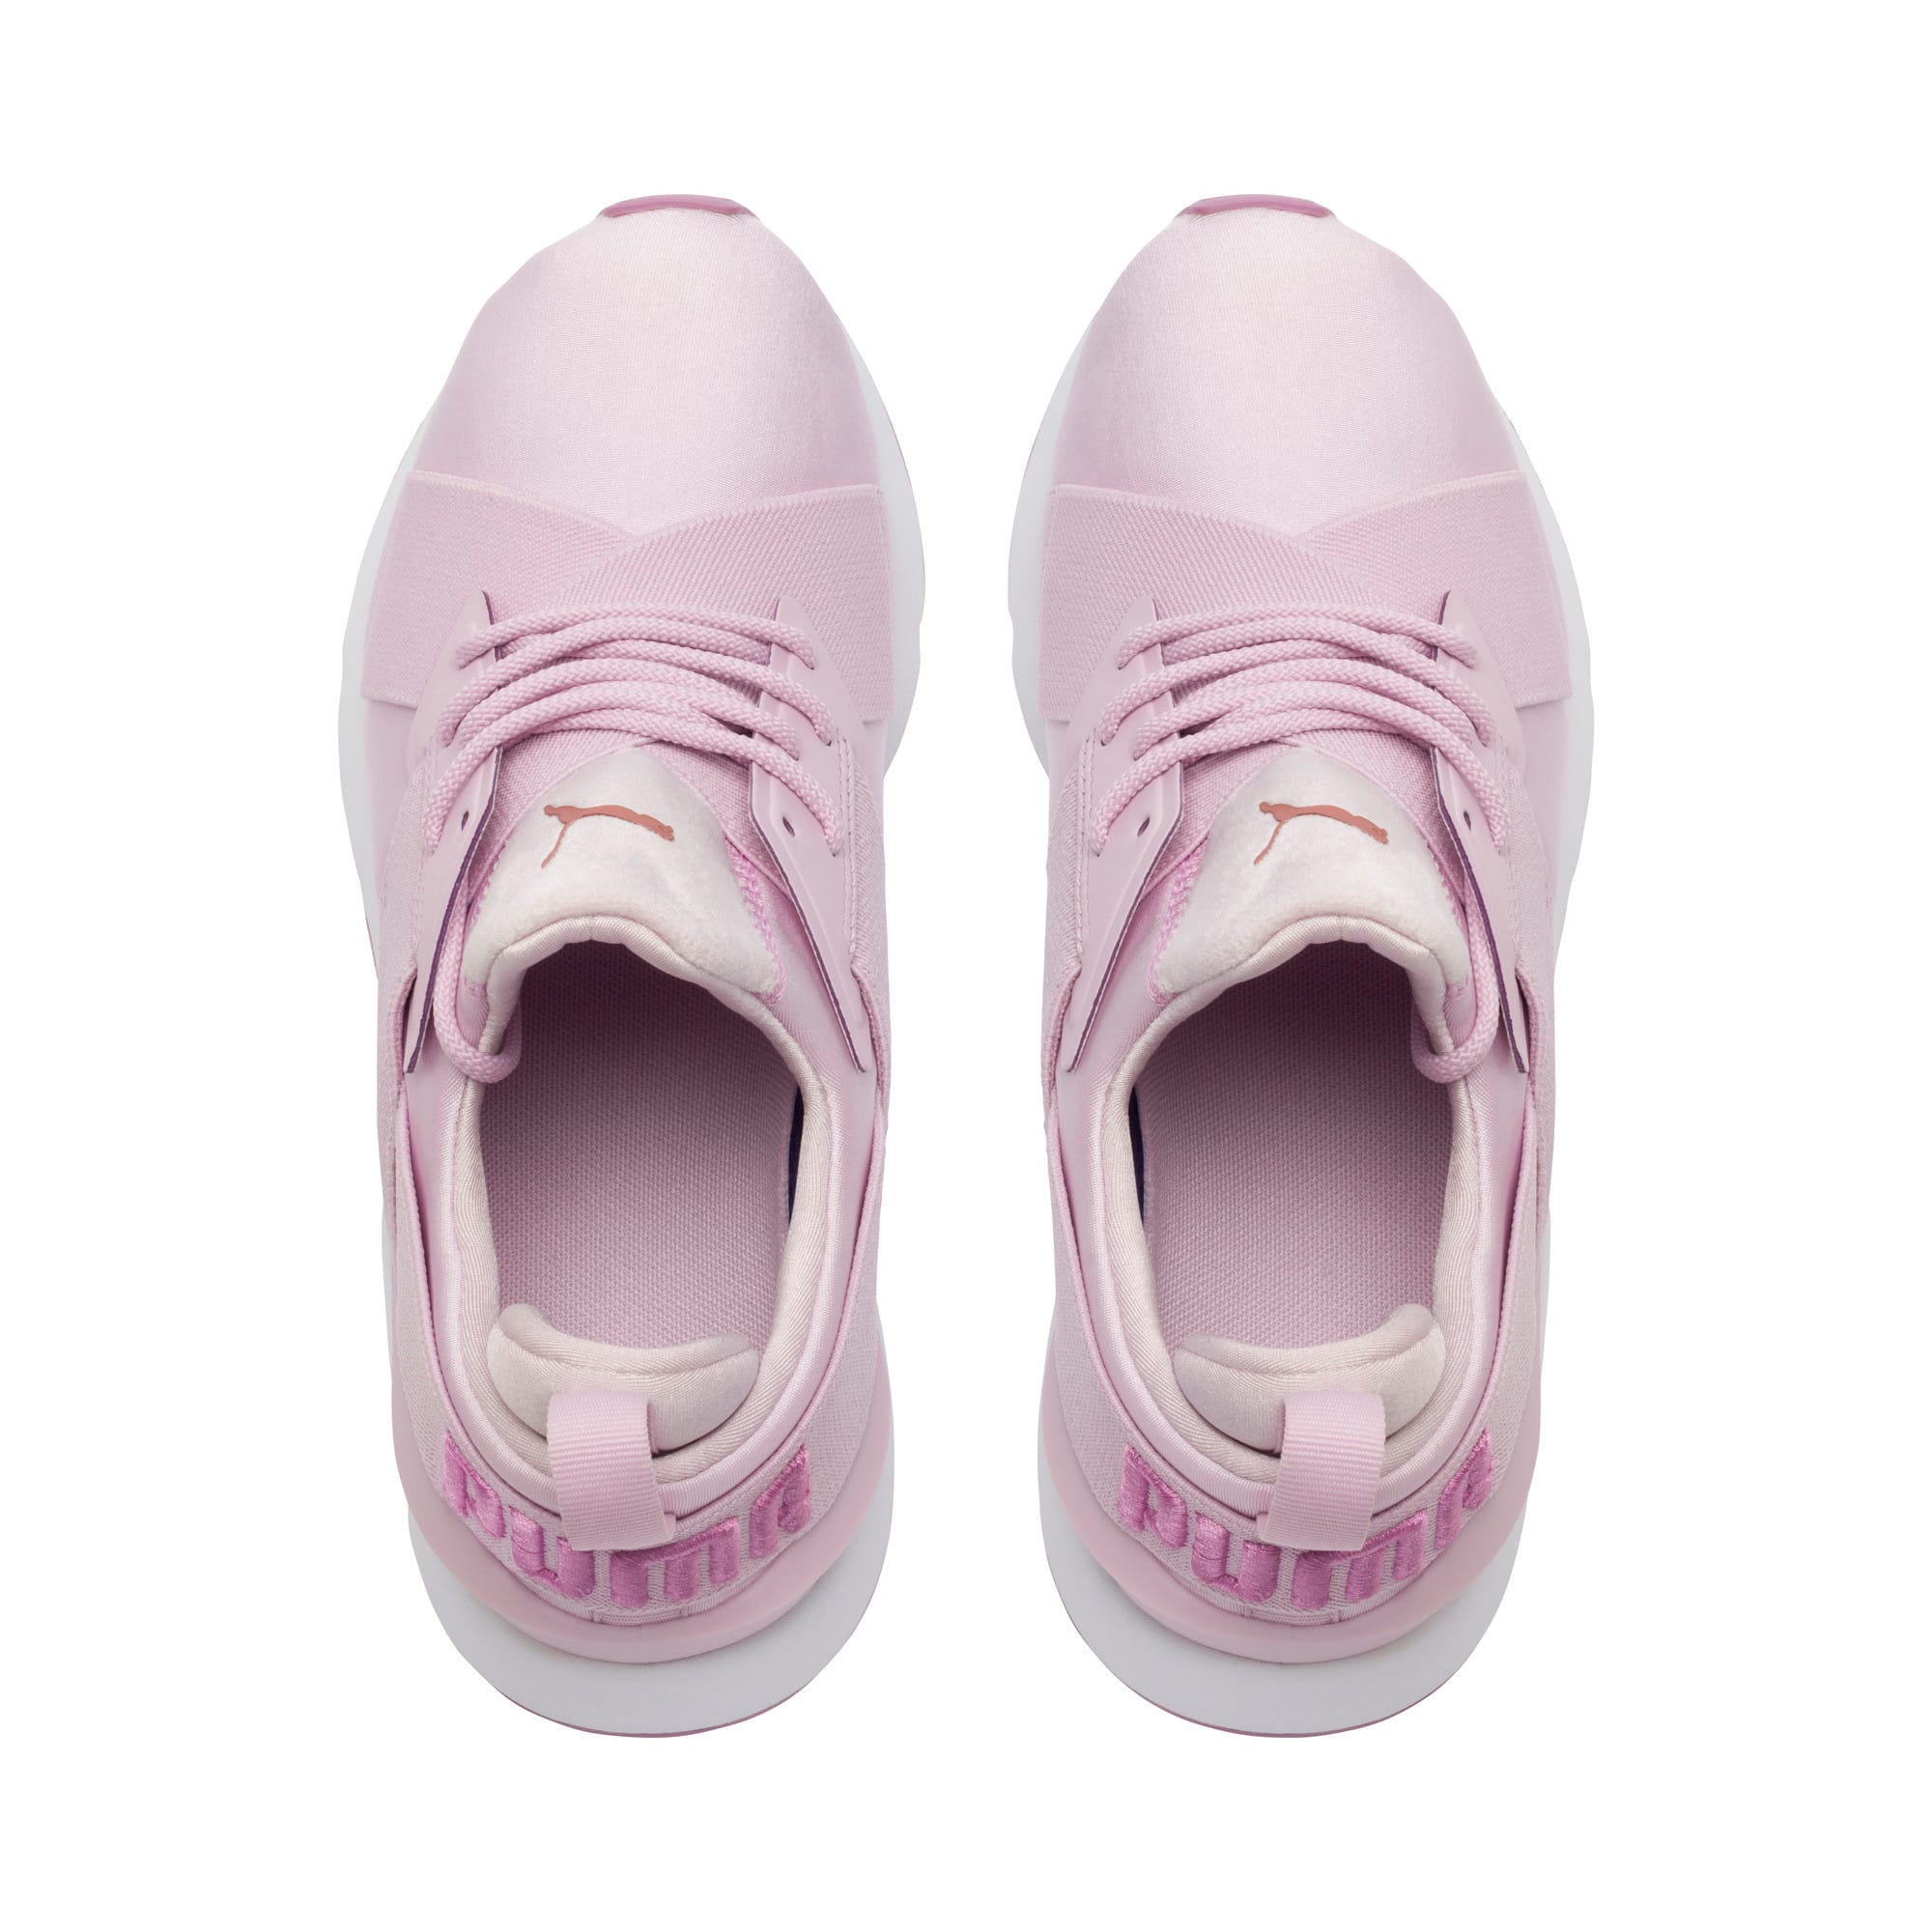 Thumbnail 6 of Muse Satin II Damen Sneaker, Winsome Orchid-Smoky Grape, medium